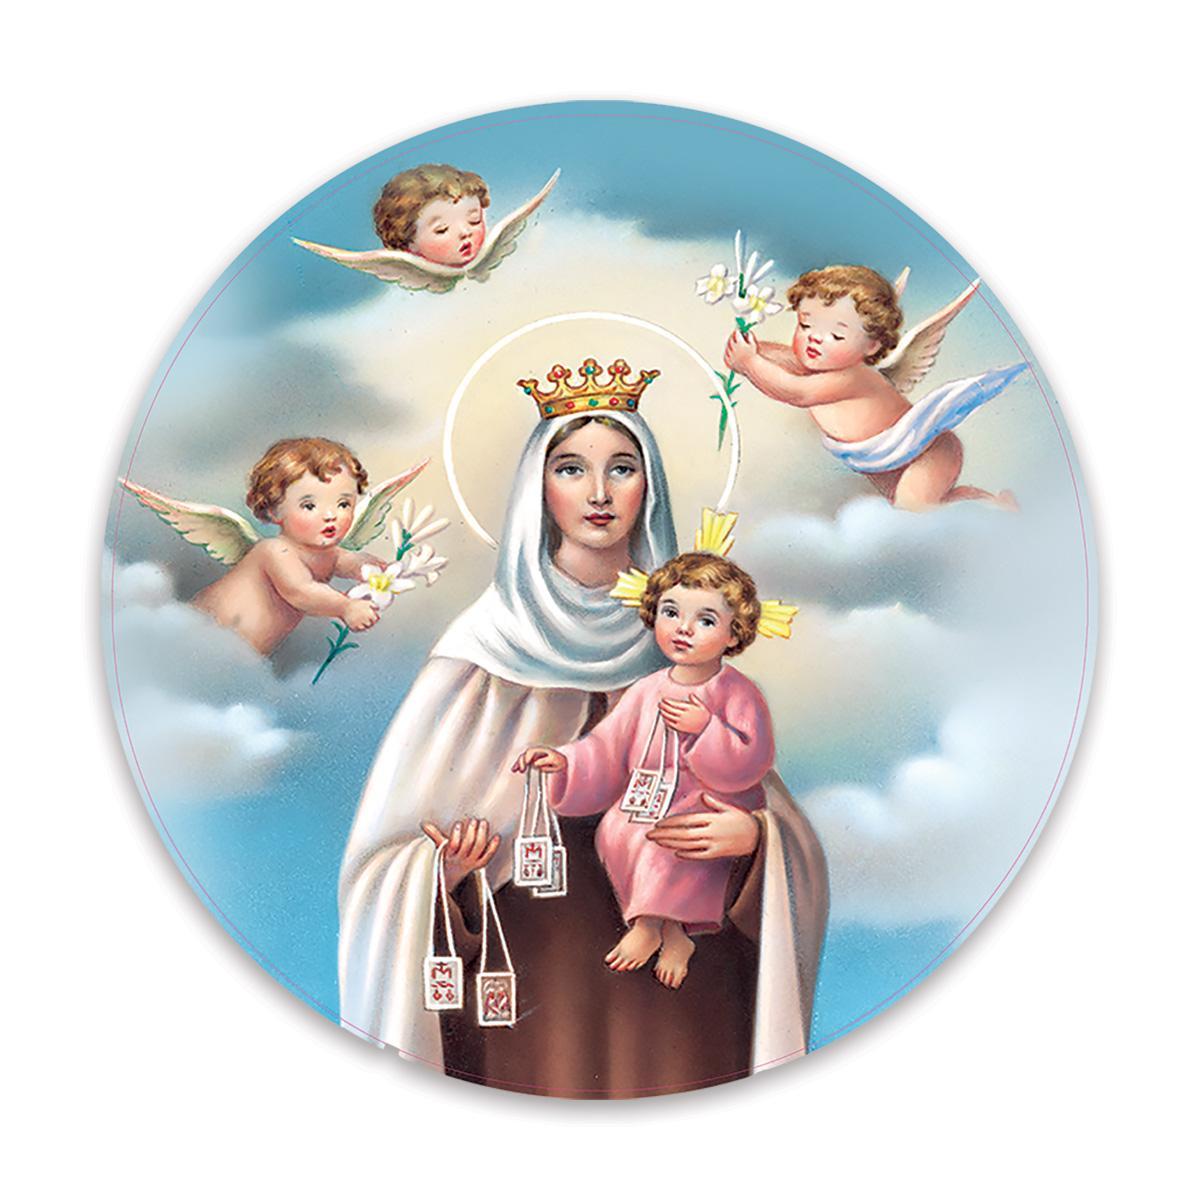 Our Lady of Mount Carmel : Gift Sticker Catholic Religious Virgin Saint Mary